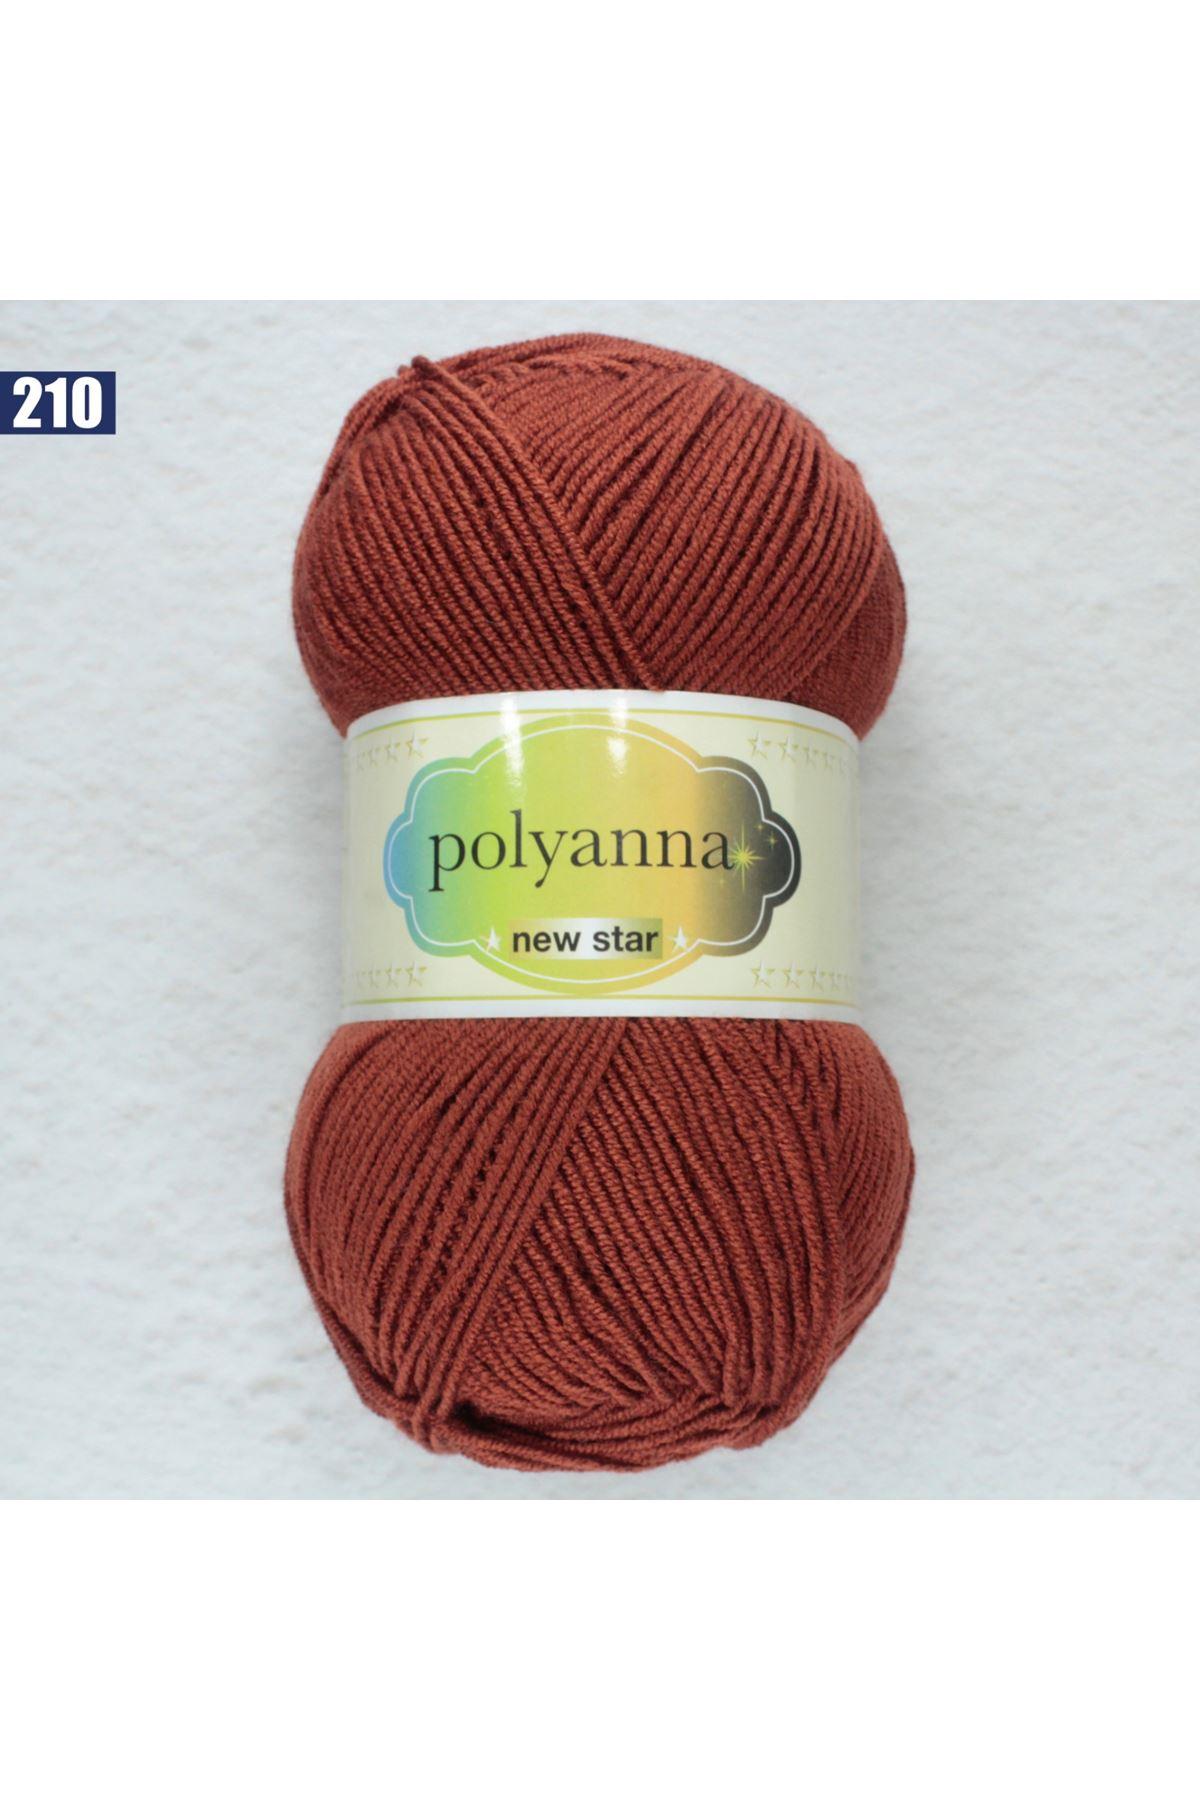 Polyanna New Star 210